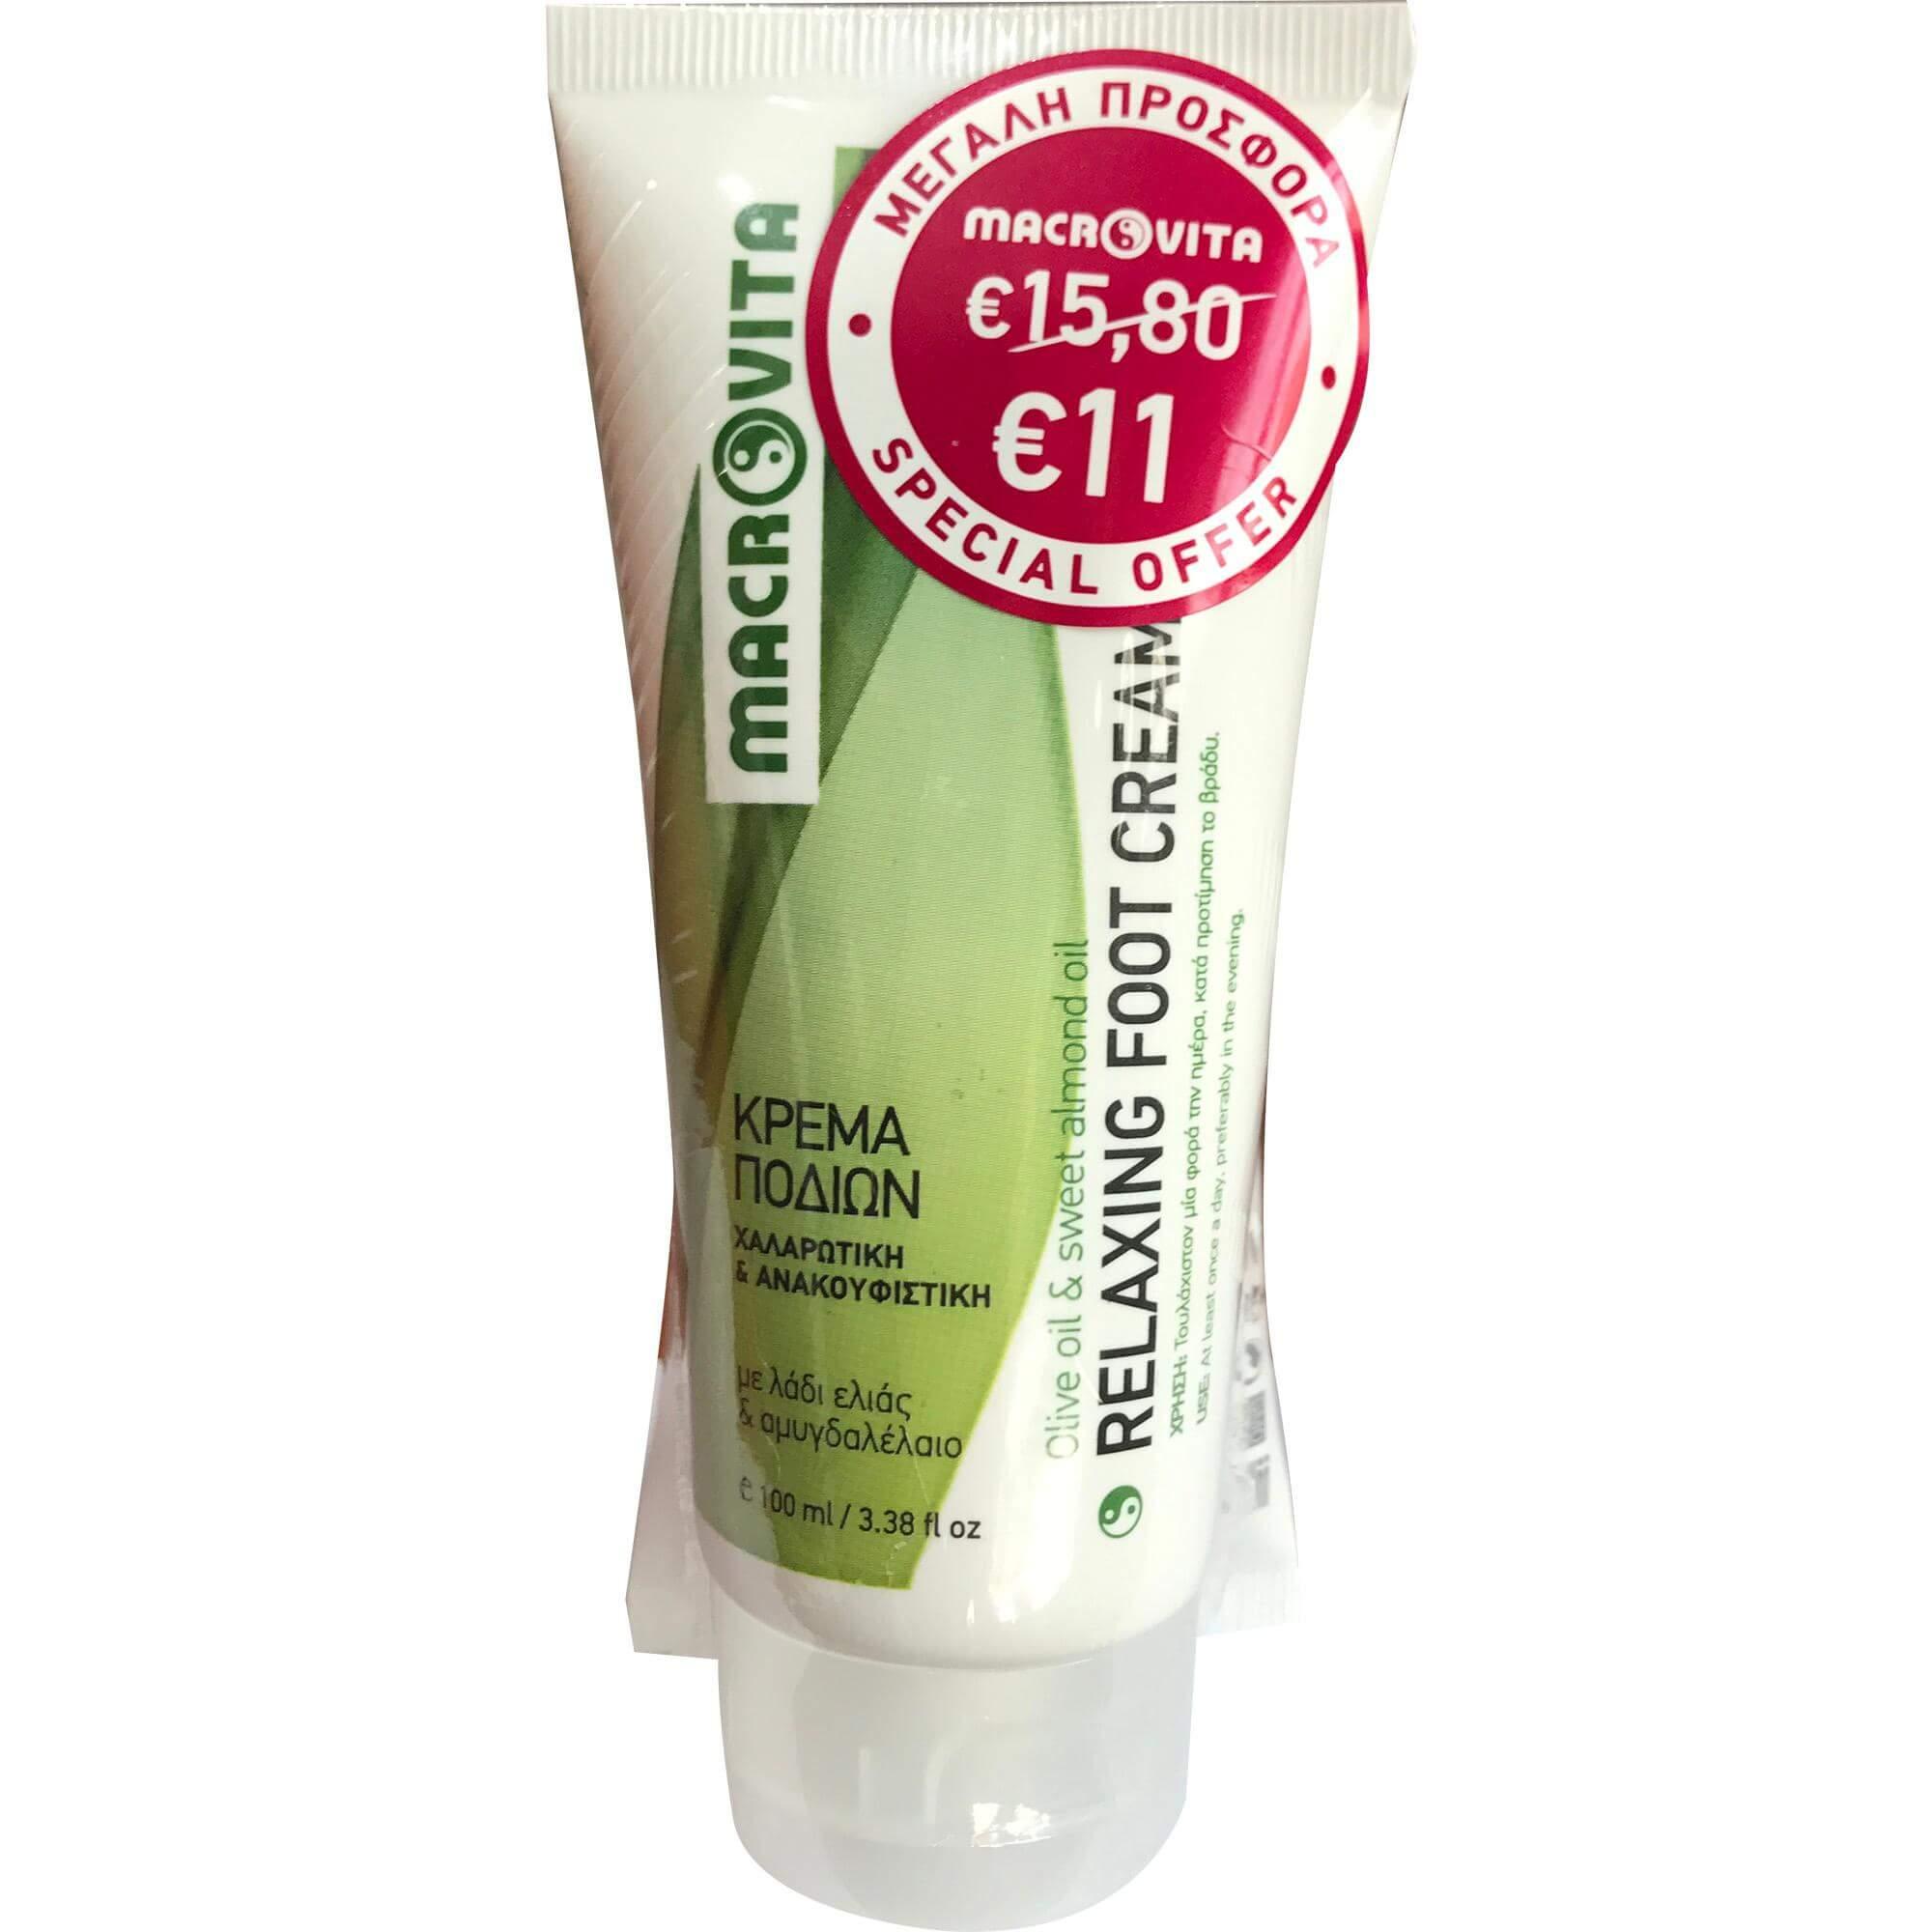 Macrovita Πακέτο Προσφοράς Relaxing Foot Cream Χαλαρωτική & Ανακουφιστική Κρέμα Ποδιών με Λάδι Ελιάς & Αμυγδαλέλαιο 100ml